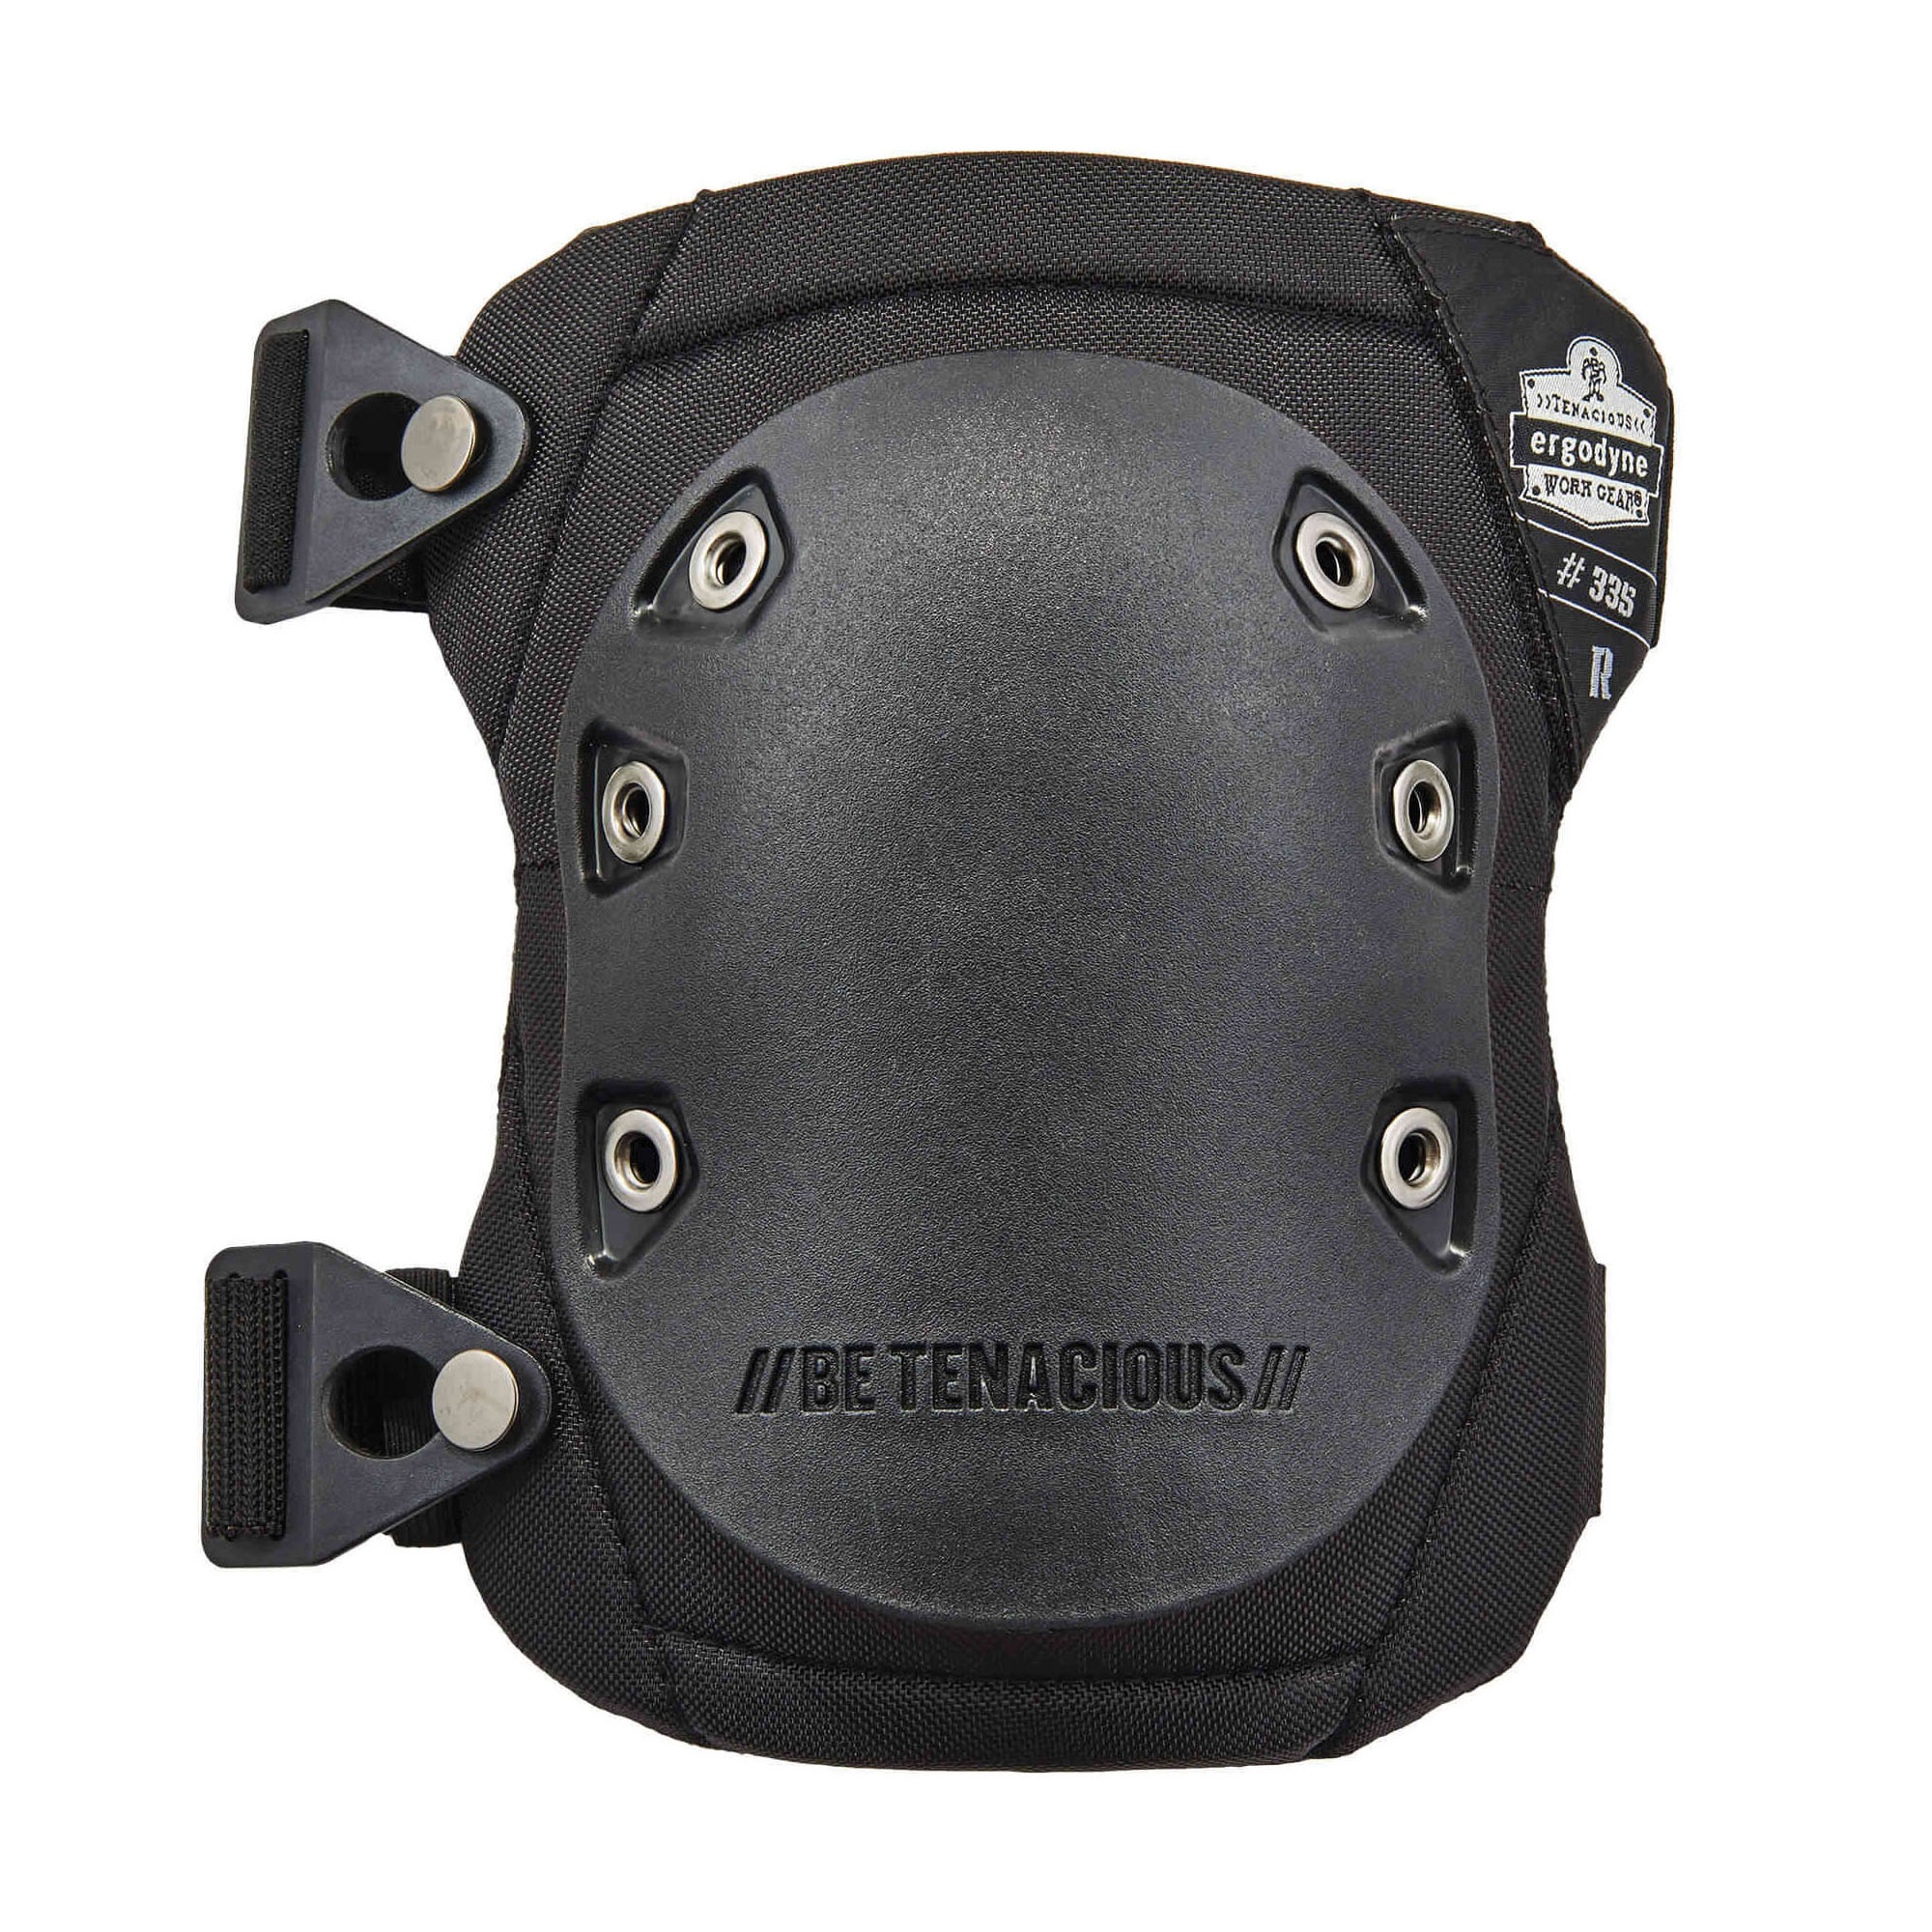 ProFlex® 18335 335 Non-Marring Cap, Rubber Cap, NBR Foam Pad, Buckle Closure, Black